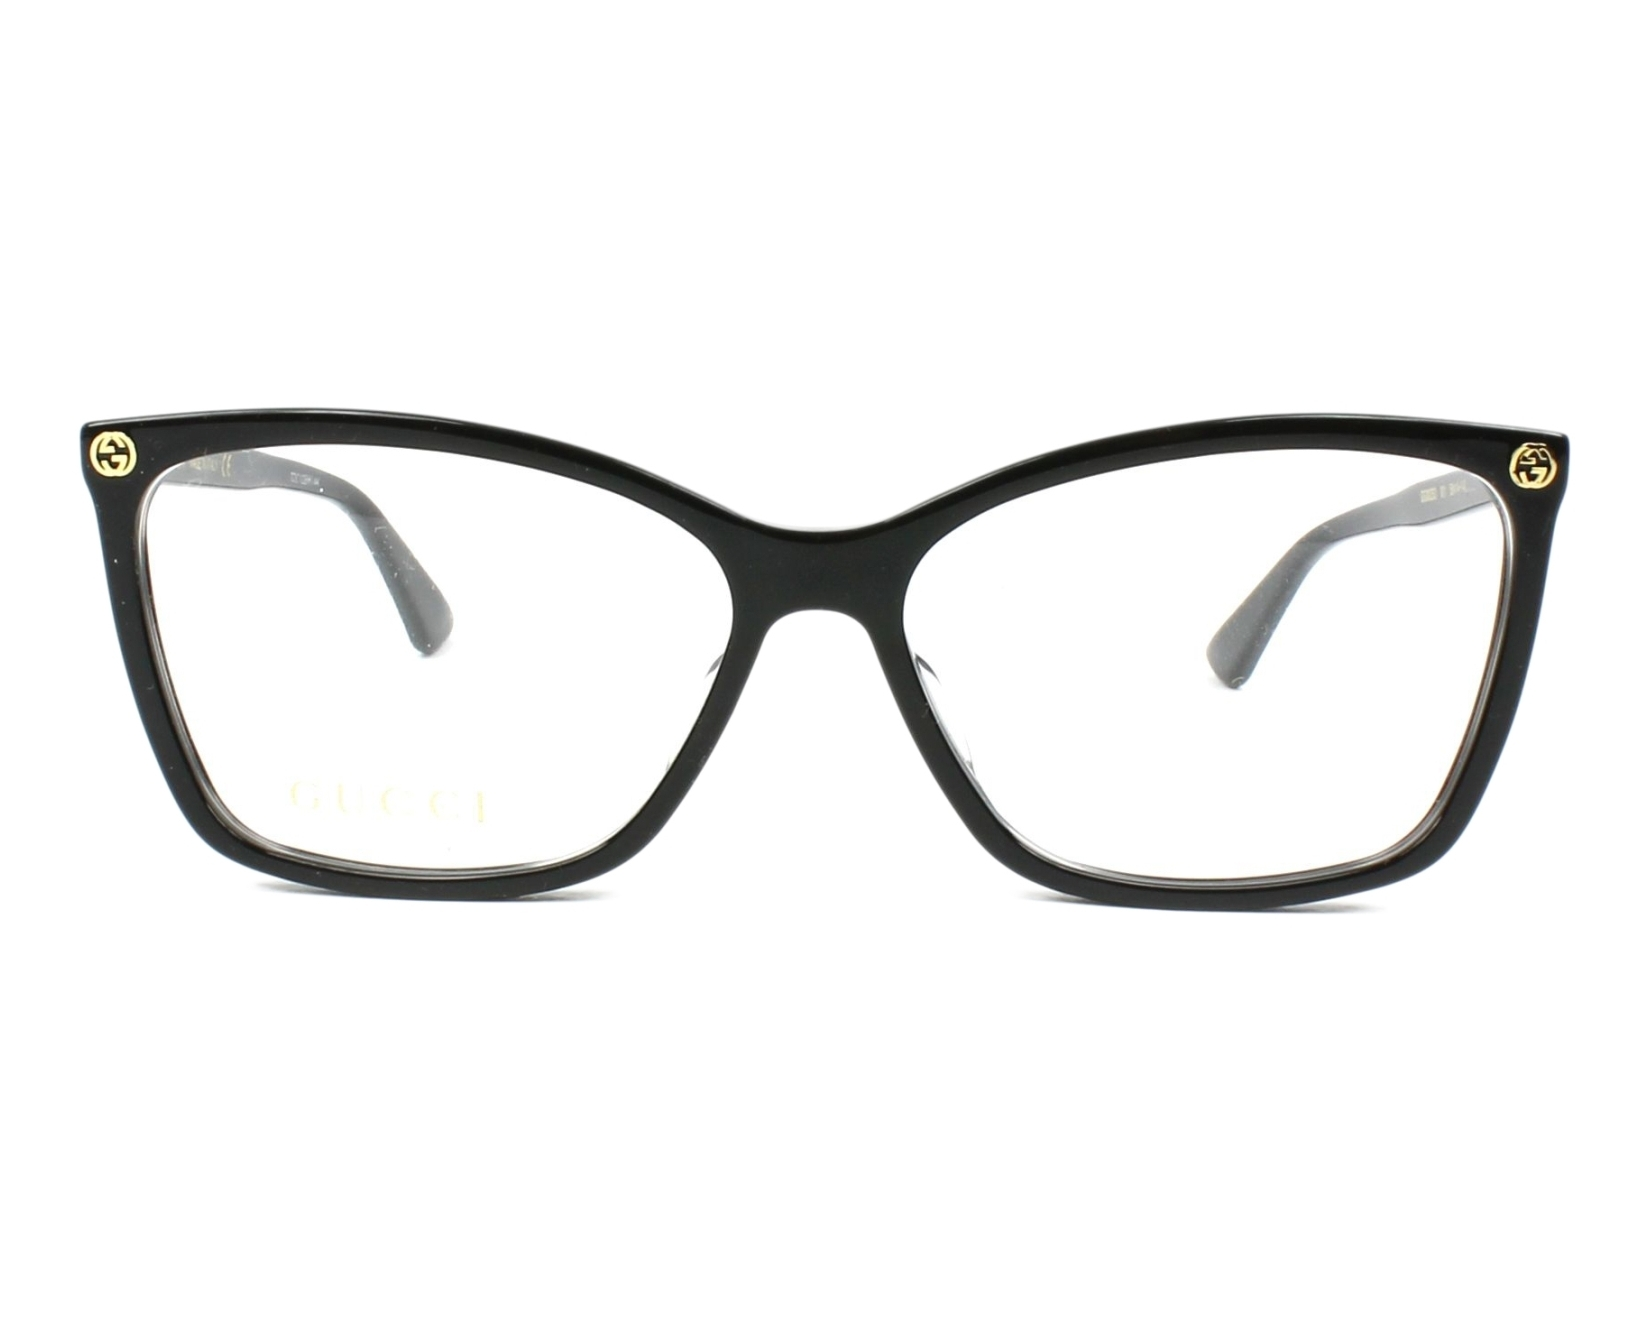 55dd536d81e eyeglasses Gucci GG-00250 001 56-14 Black front view